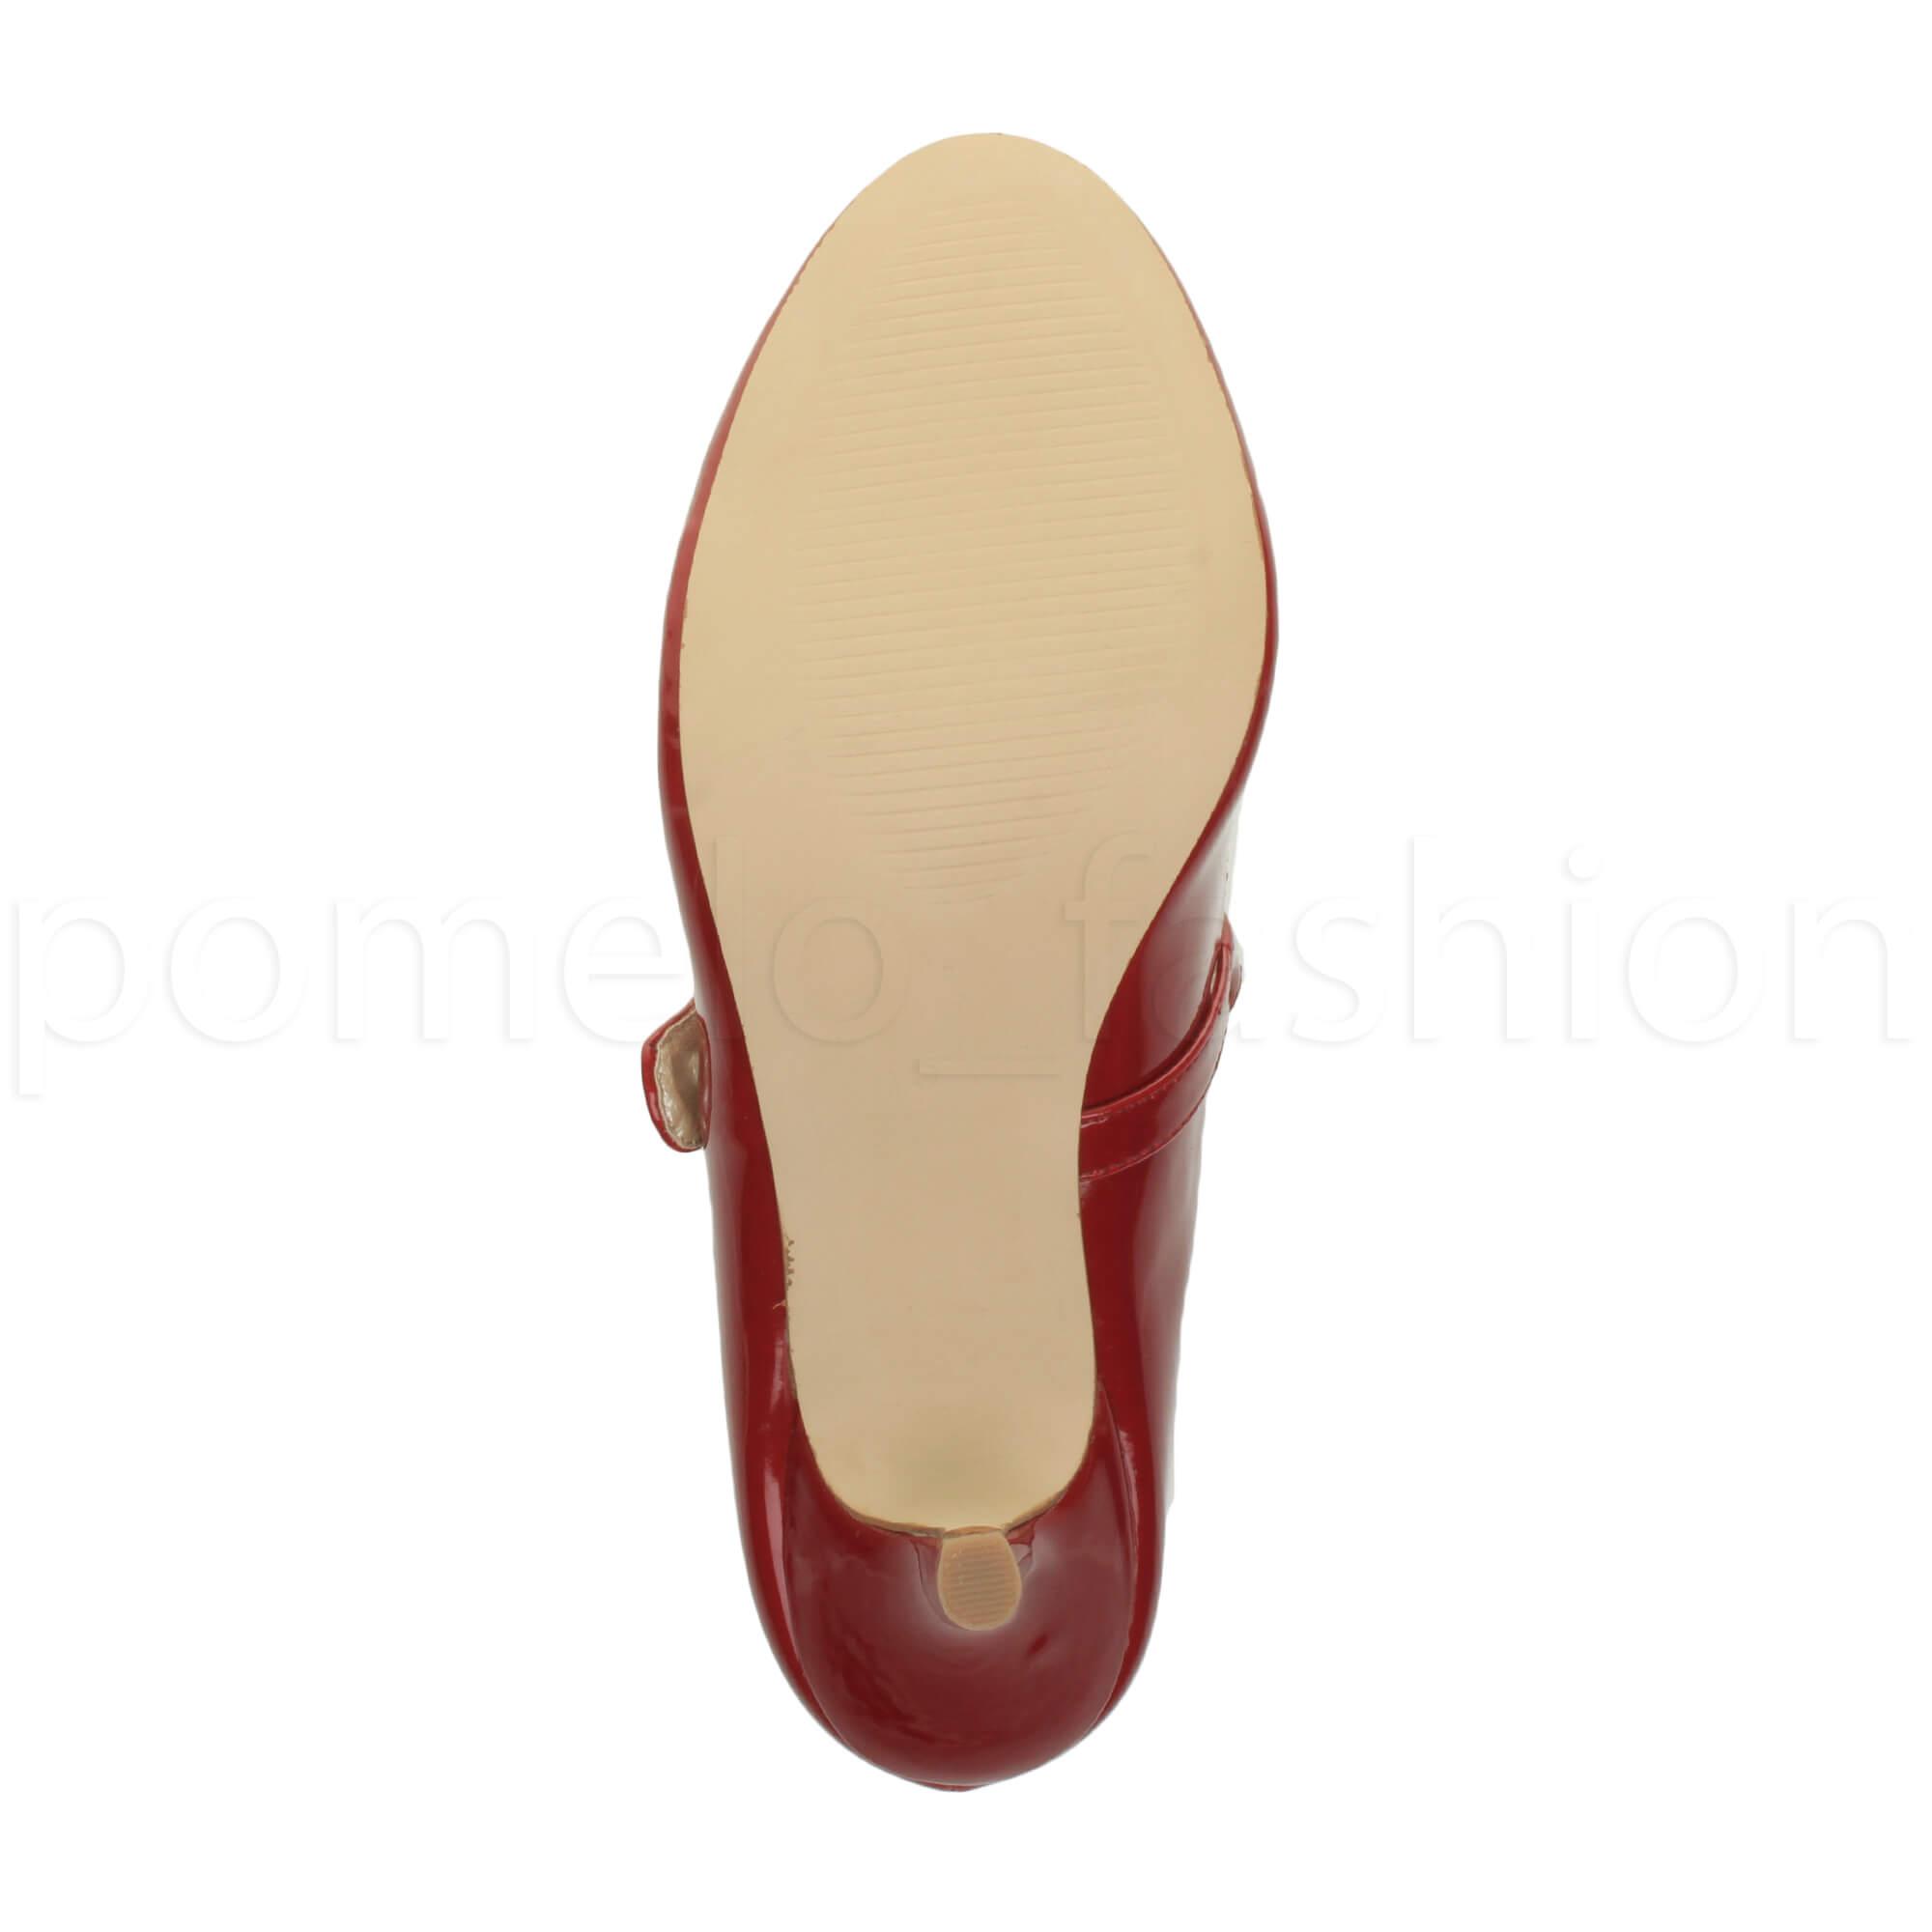 miniatura 50 - Donna basso tacco medio Mary Jane Damigella Matrimonio Pompe Scarpe Da Sera Taglia